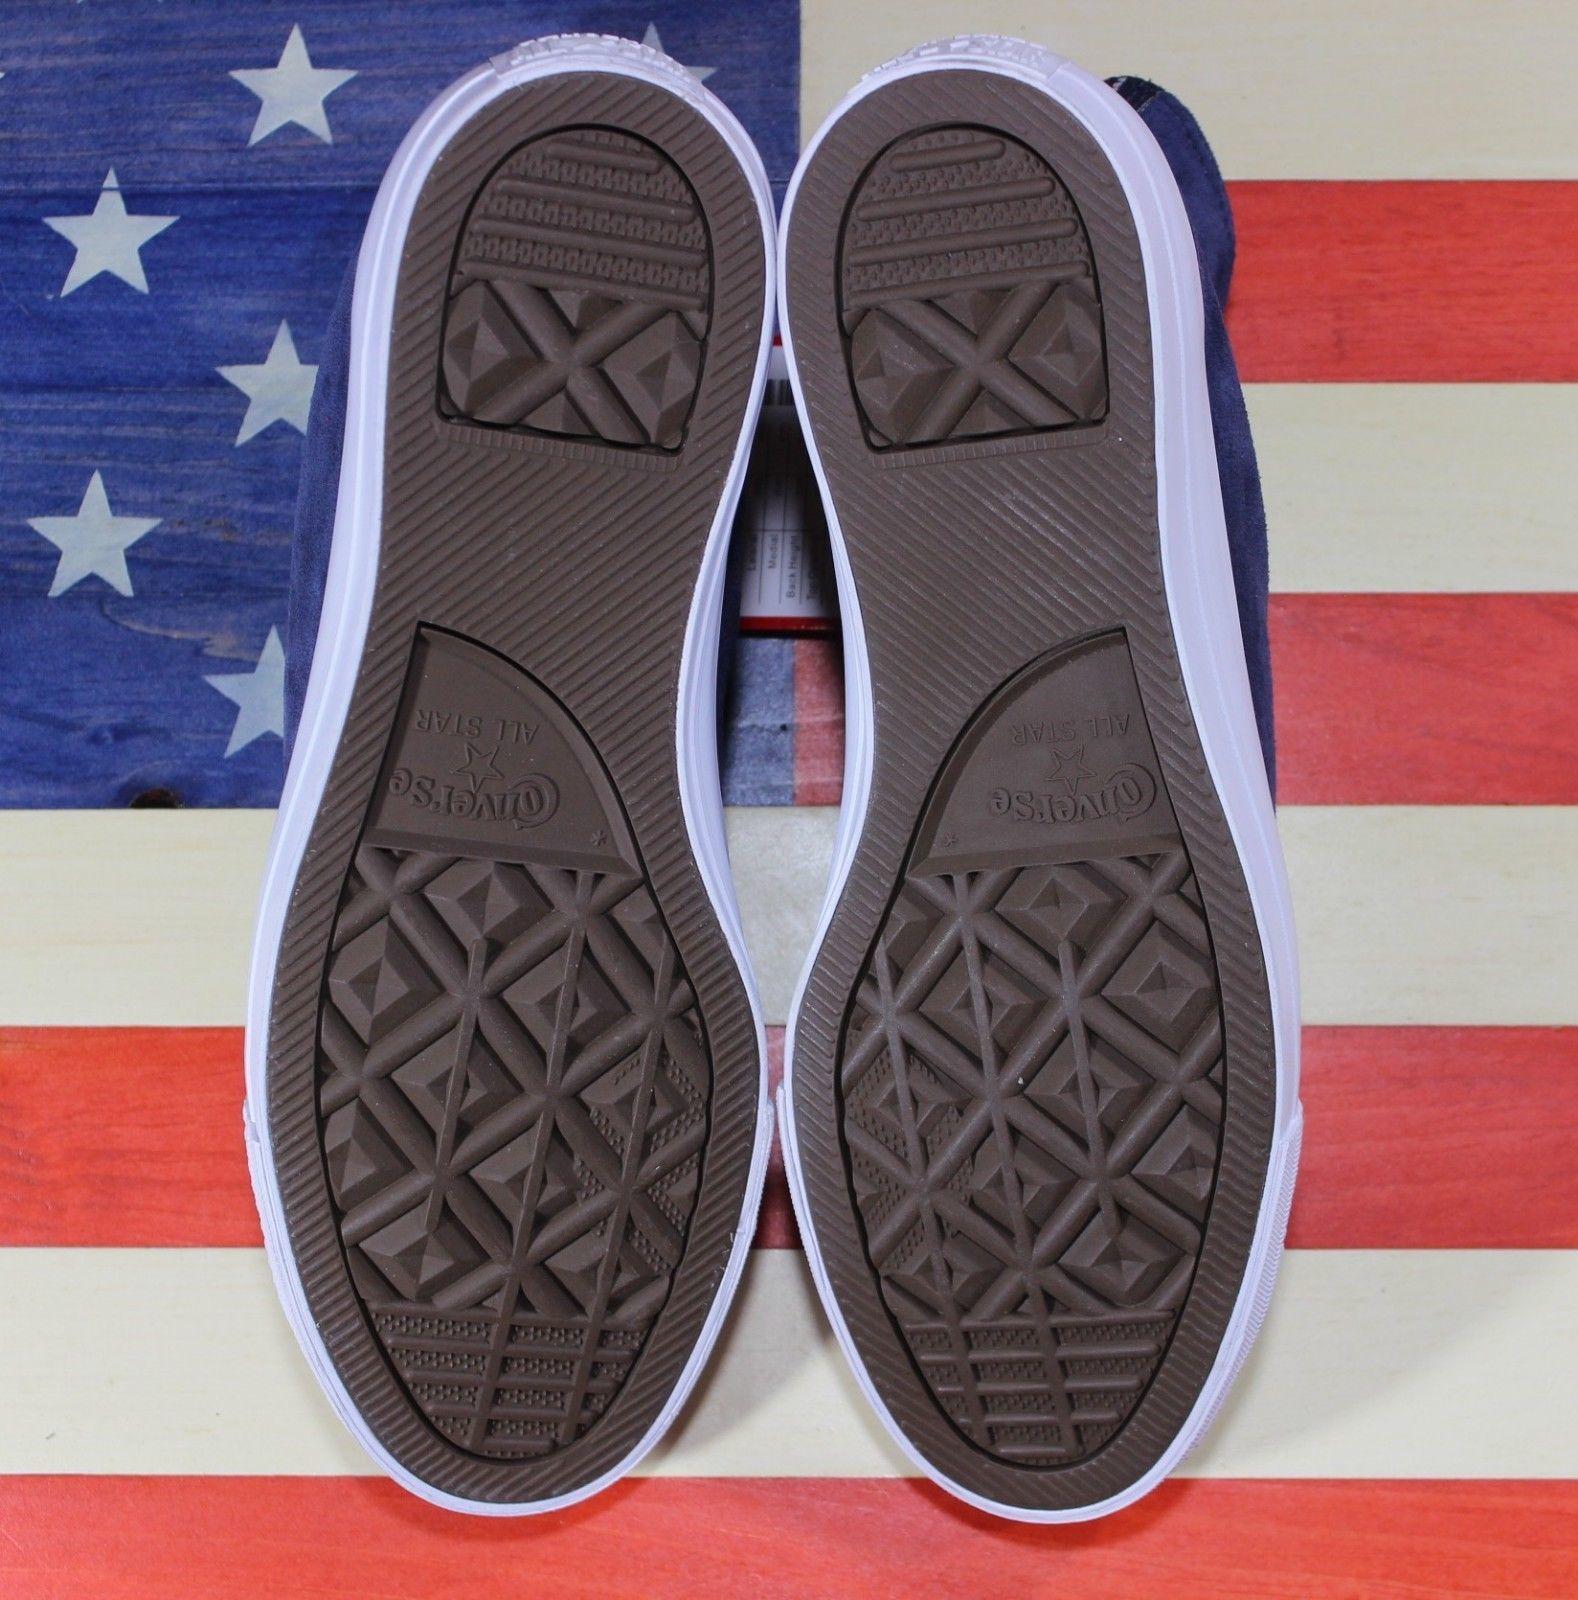 3a898c39afe CONVERSE SAMPLE Chuck Taylor CTAS ALL-STAR HI Suede BLUE White Shoes   157521C